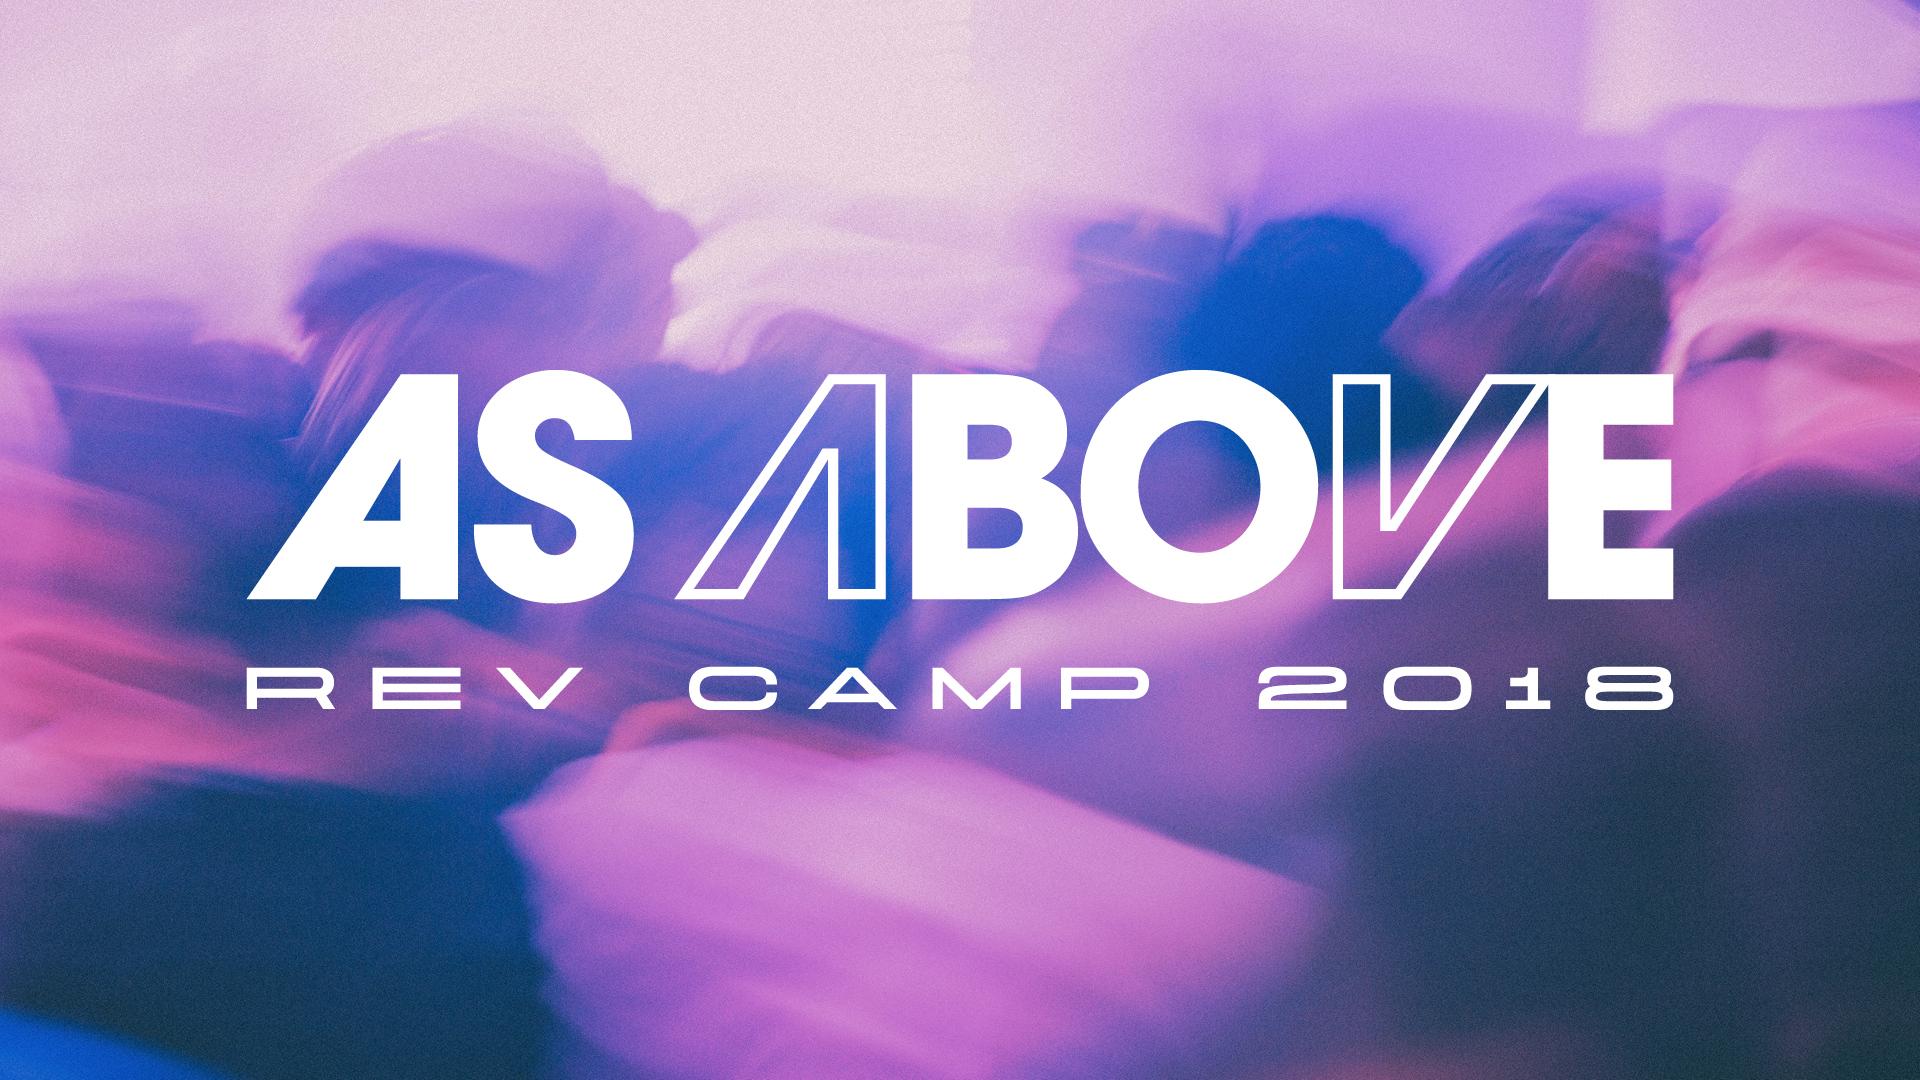 Rev Camp 2018 As Above Generic Slides8.jpg